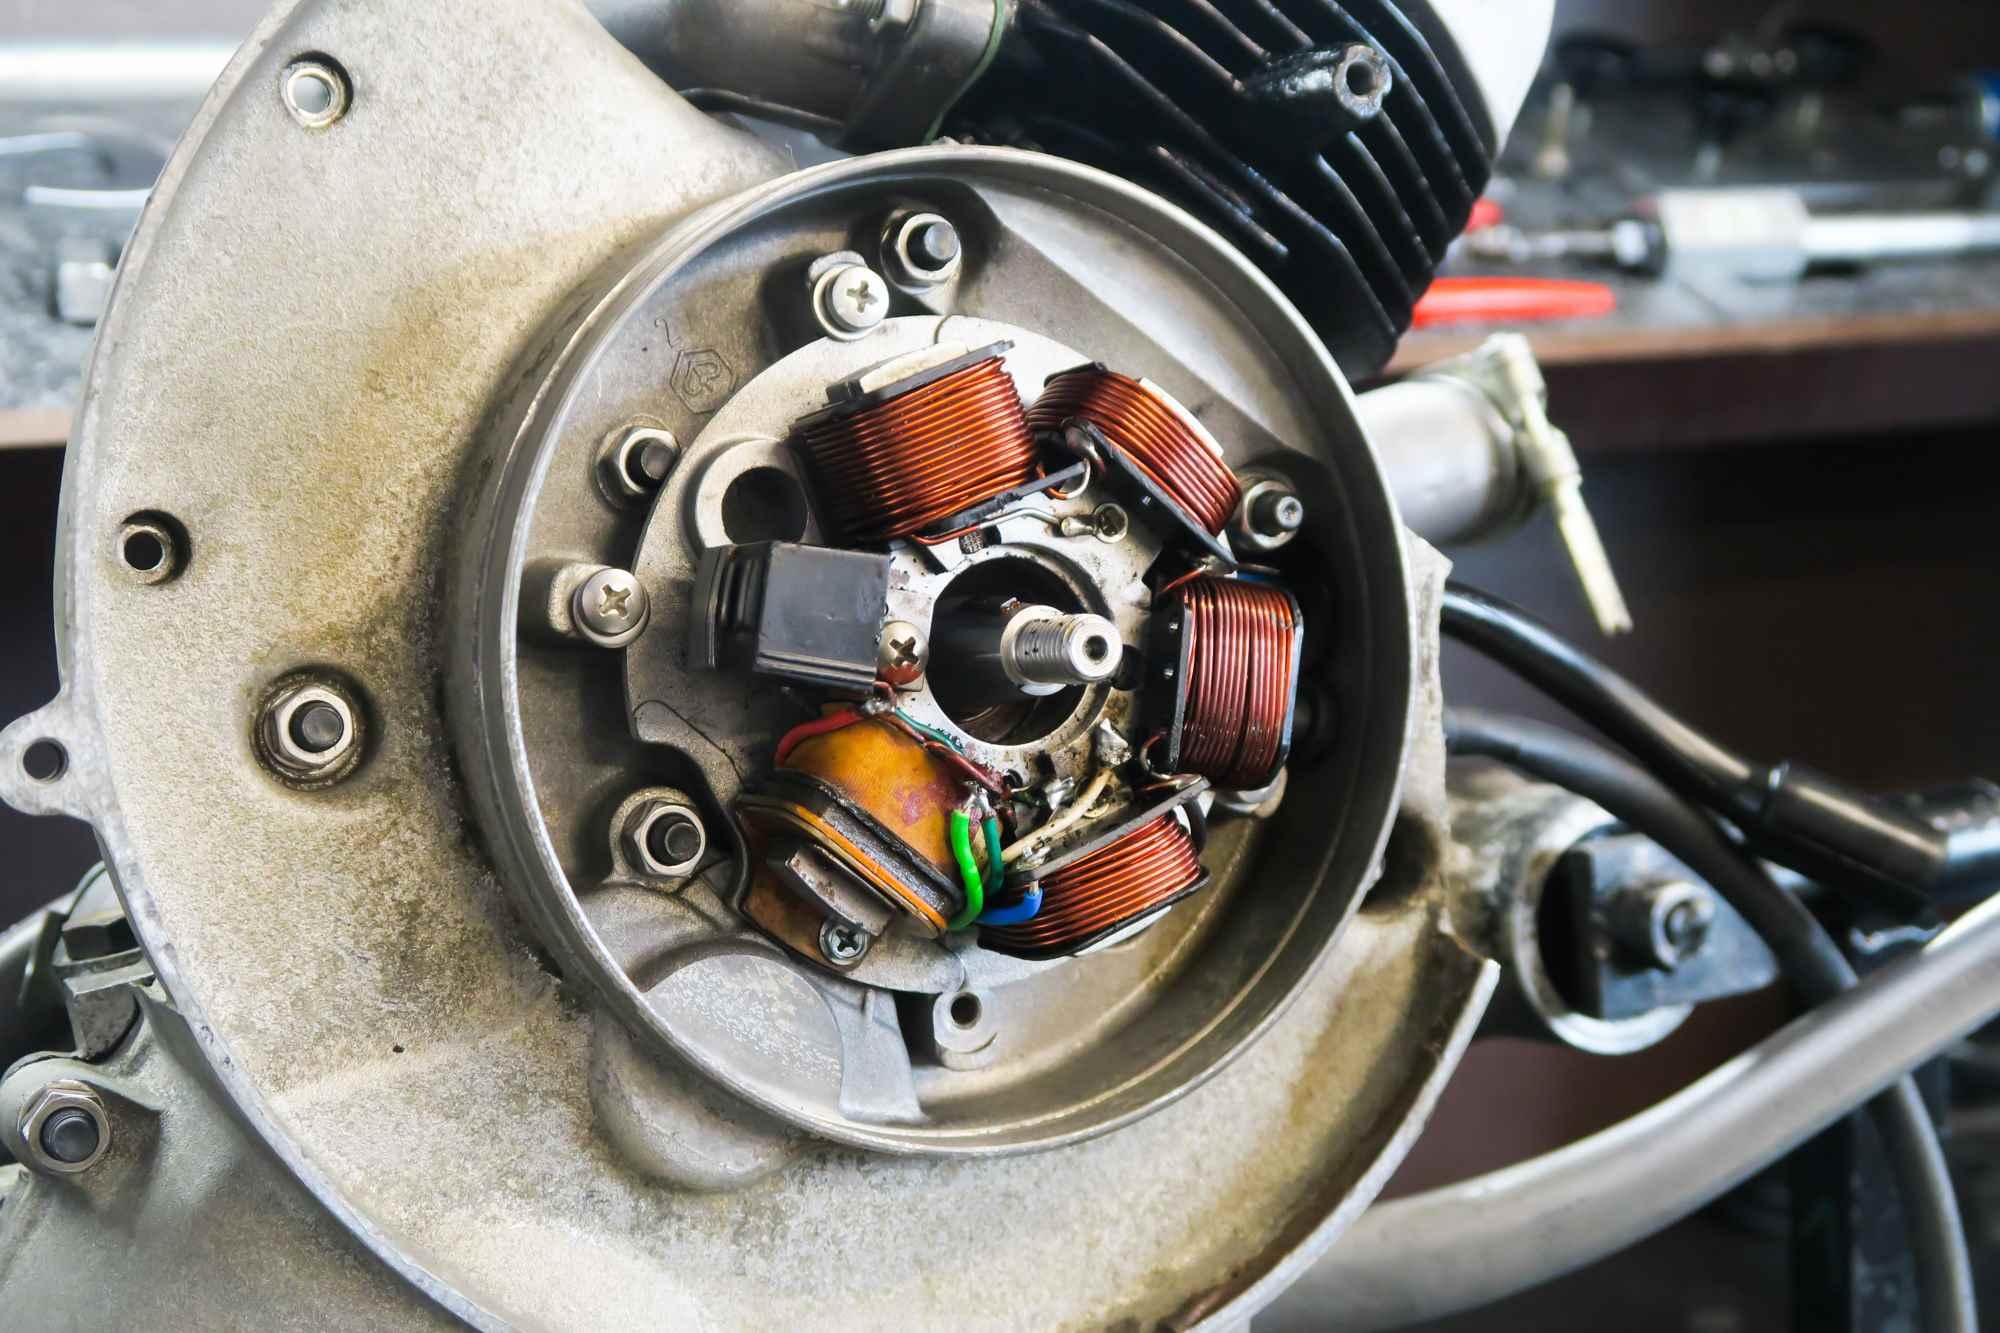 Elektronikzündung Vespa PK50 eingebaut am Motor